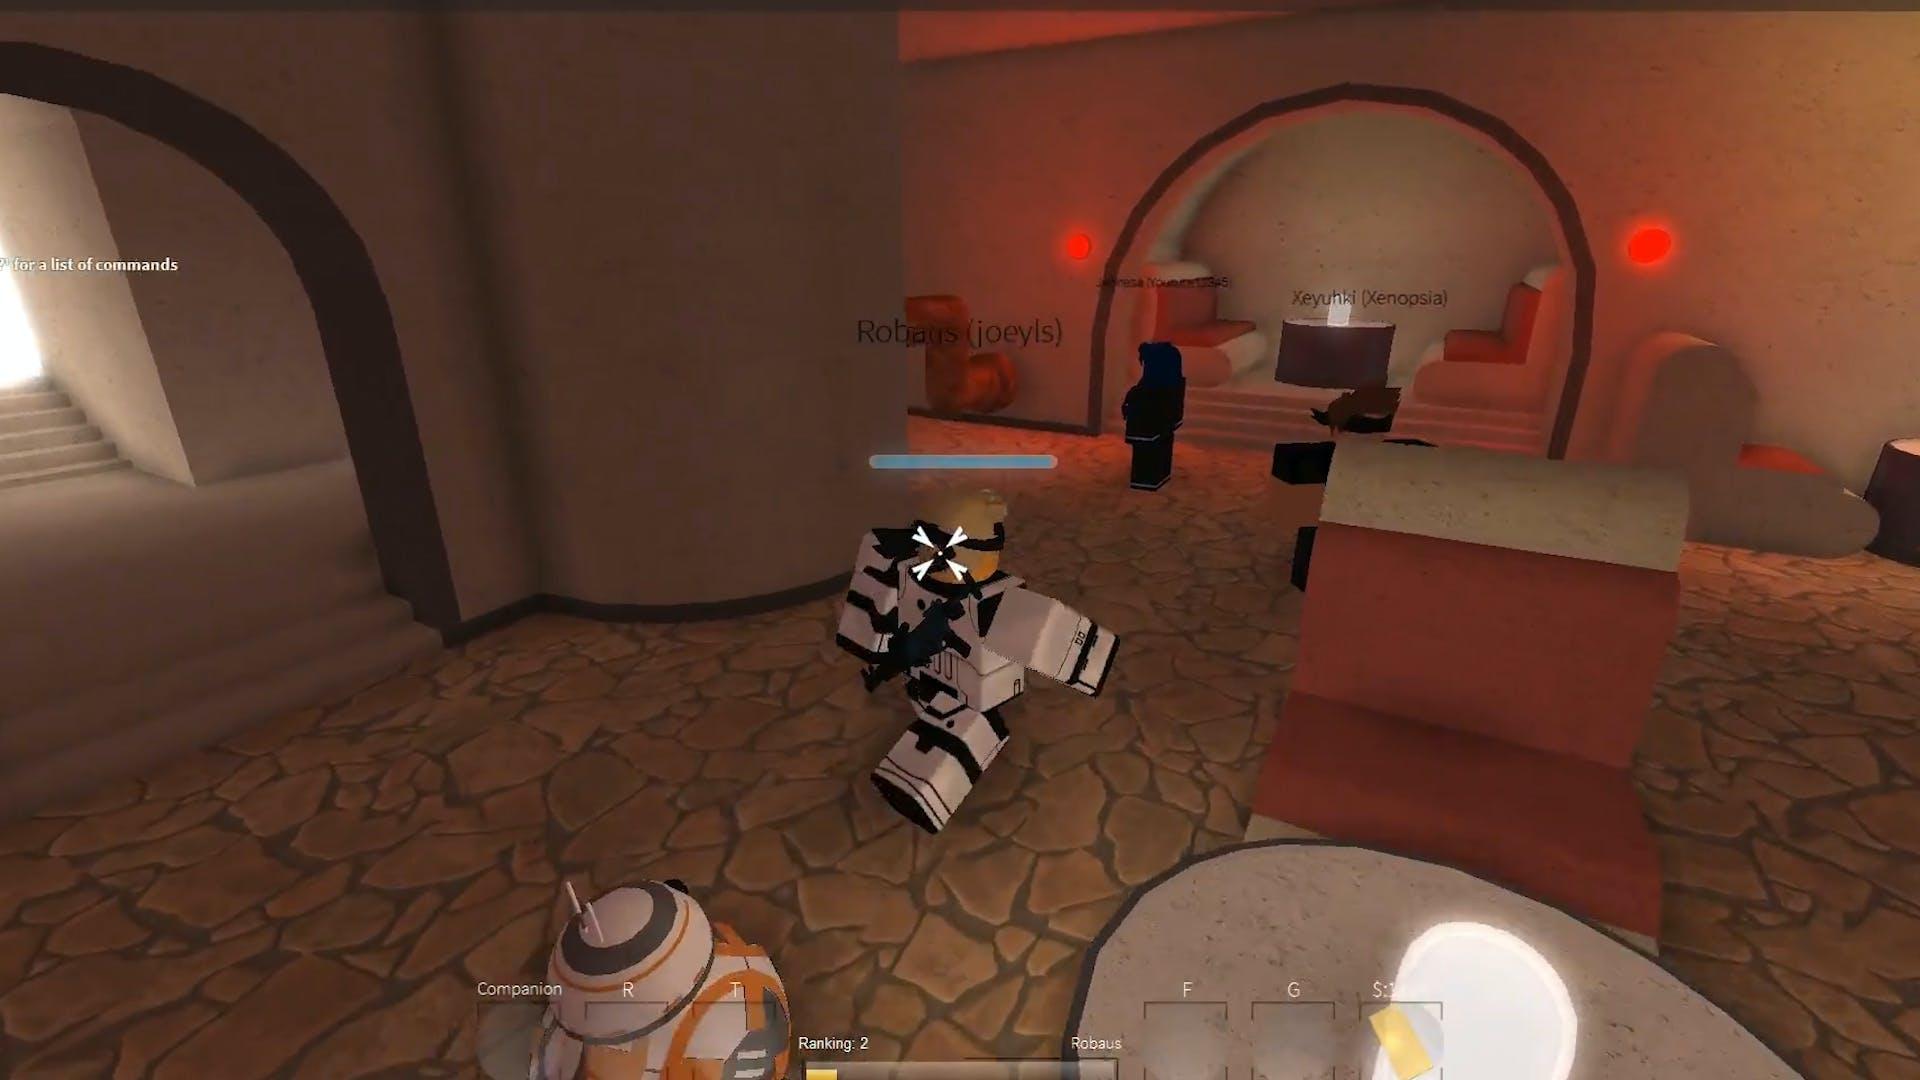 Best Roblox Games: Star Wars Offline Adventure screen shot